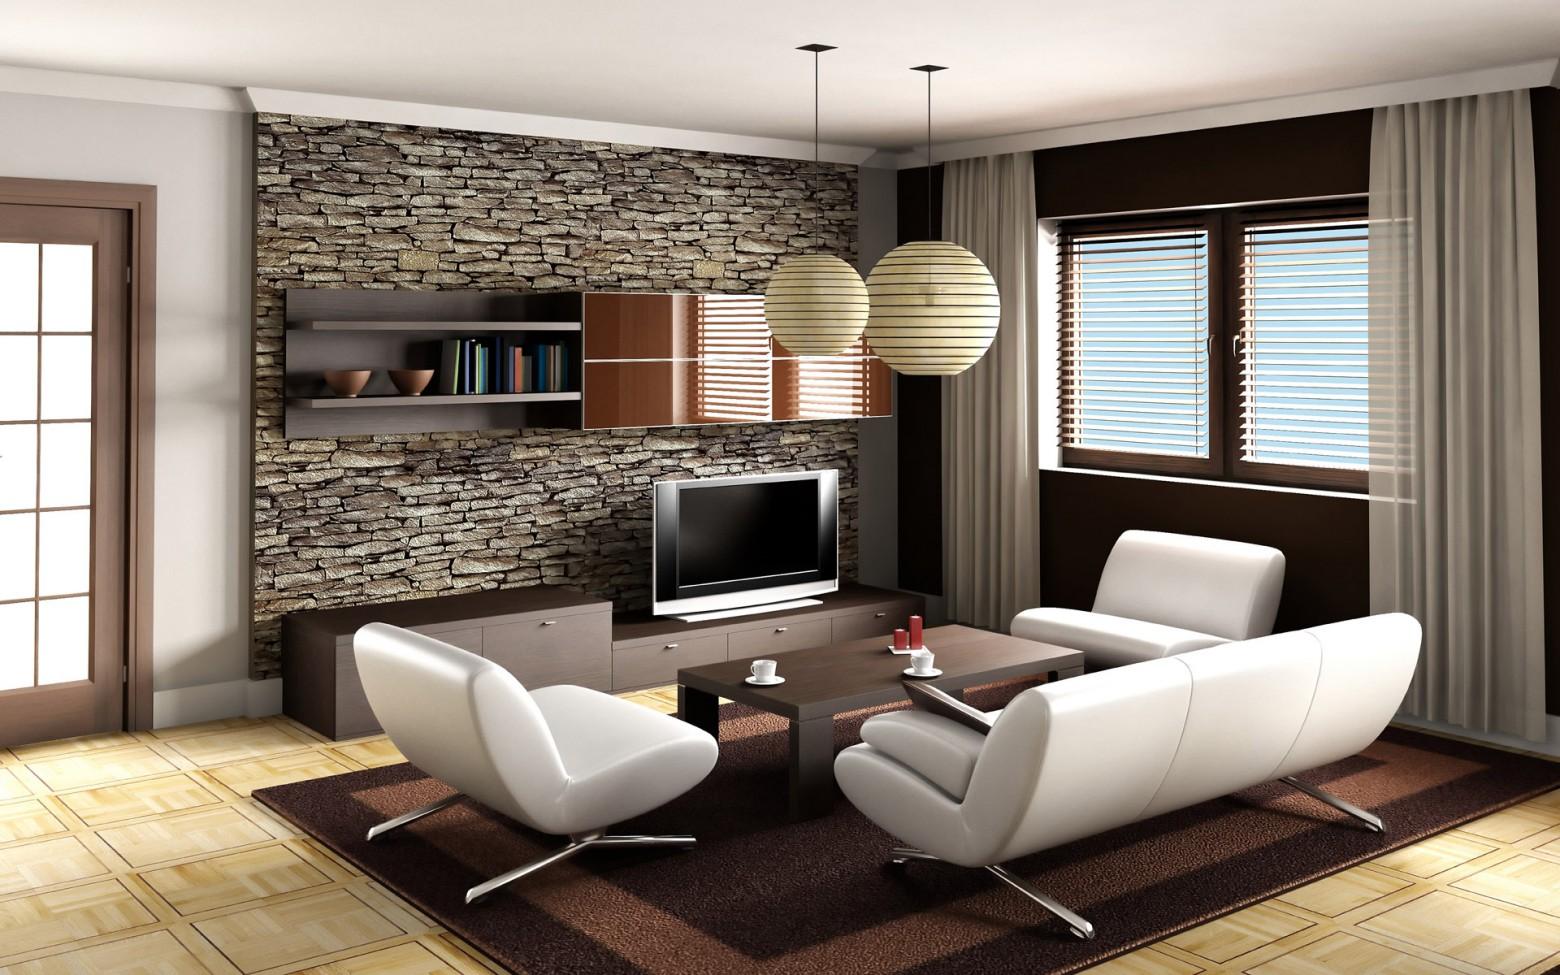 Handla designmöbler online